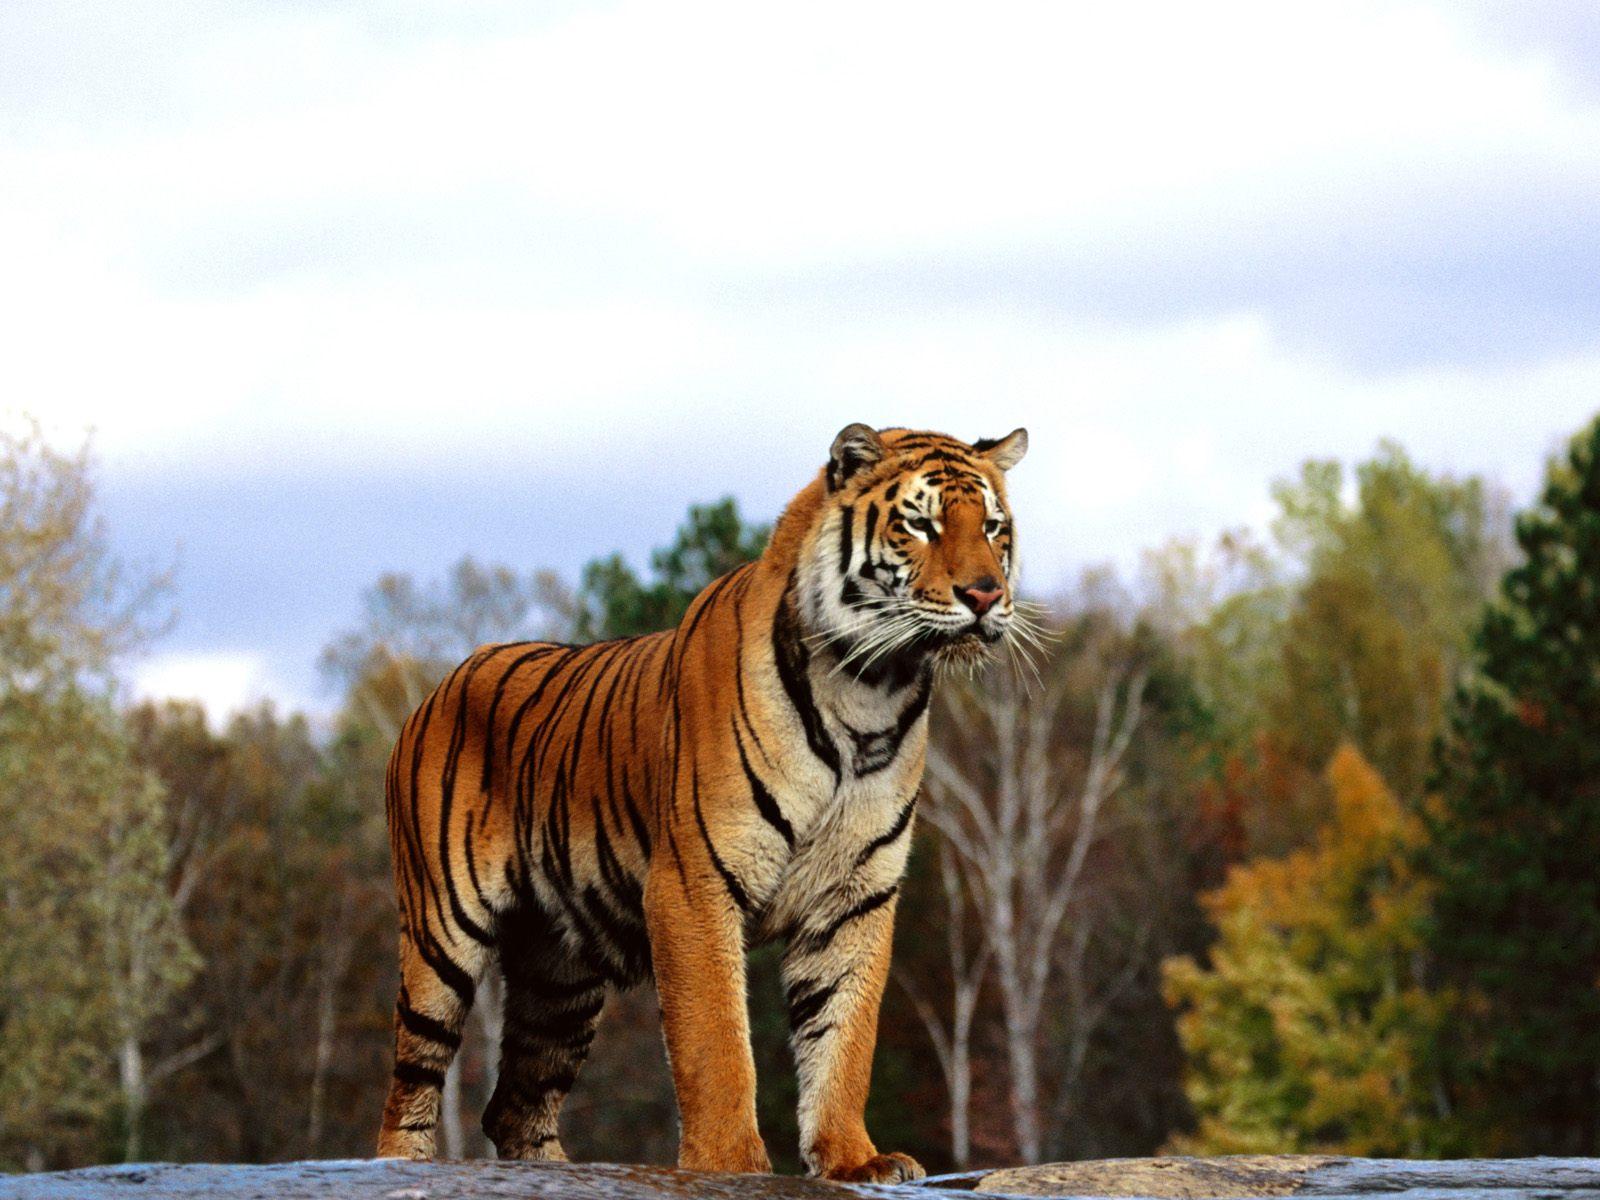 Full Hd Wallpapers 1080p Desktop Free Download Download Free Bengal Tiger Wallpaper Pixelstalk Net